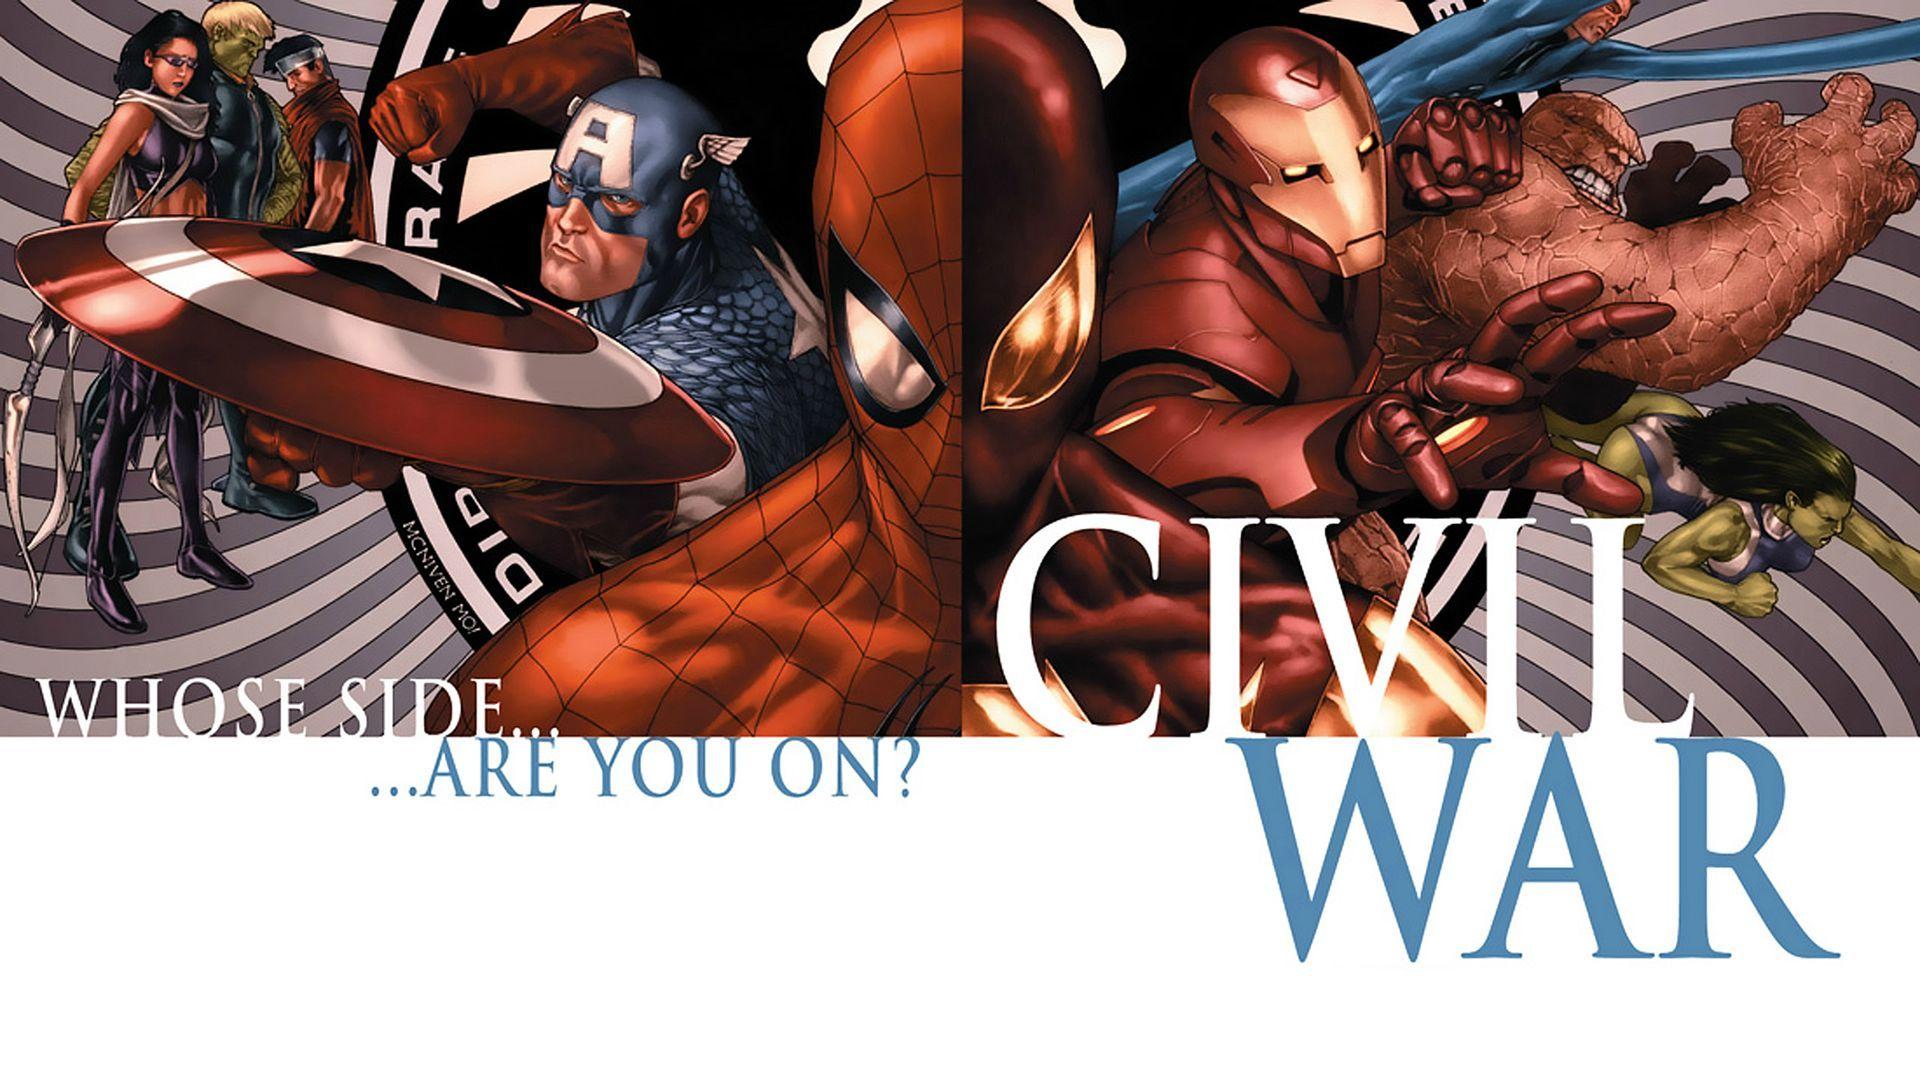 Marvel Civil War HD Wallpaper 2048x1280 Wallpapers 44